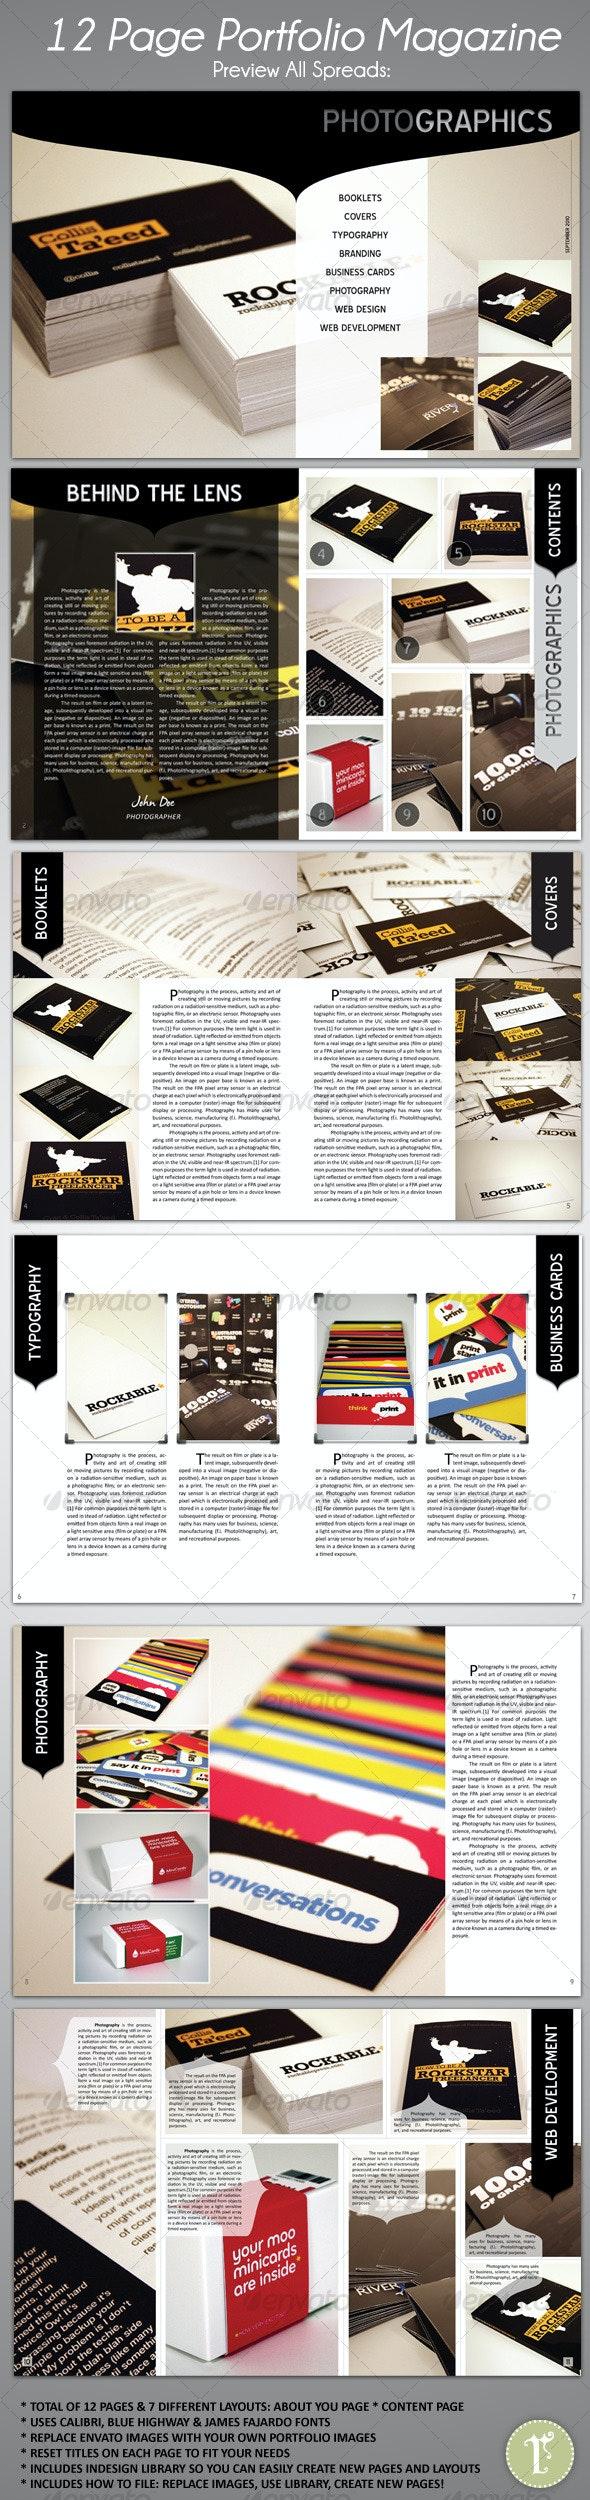 12 Page Portfolio Magazine Kit - Magazines Print Templates